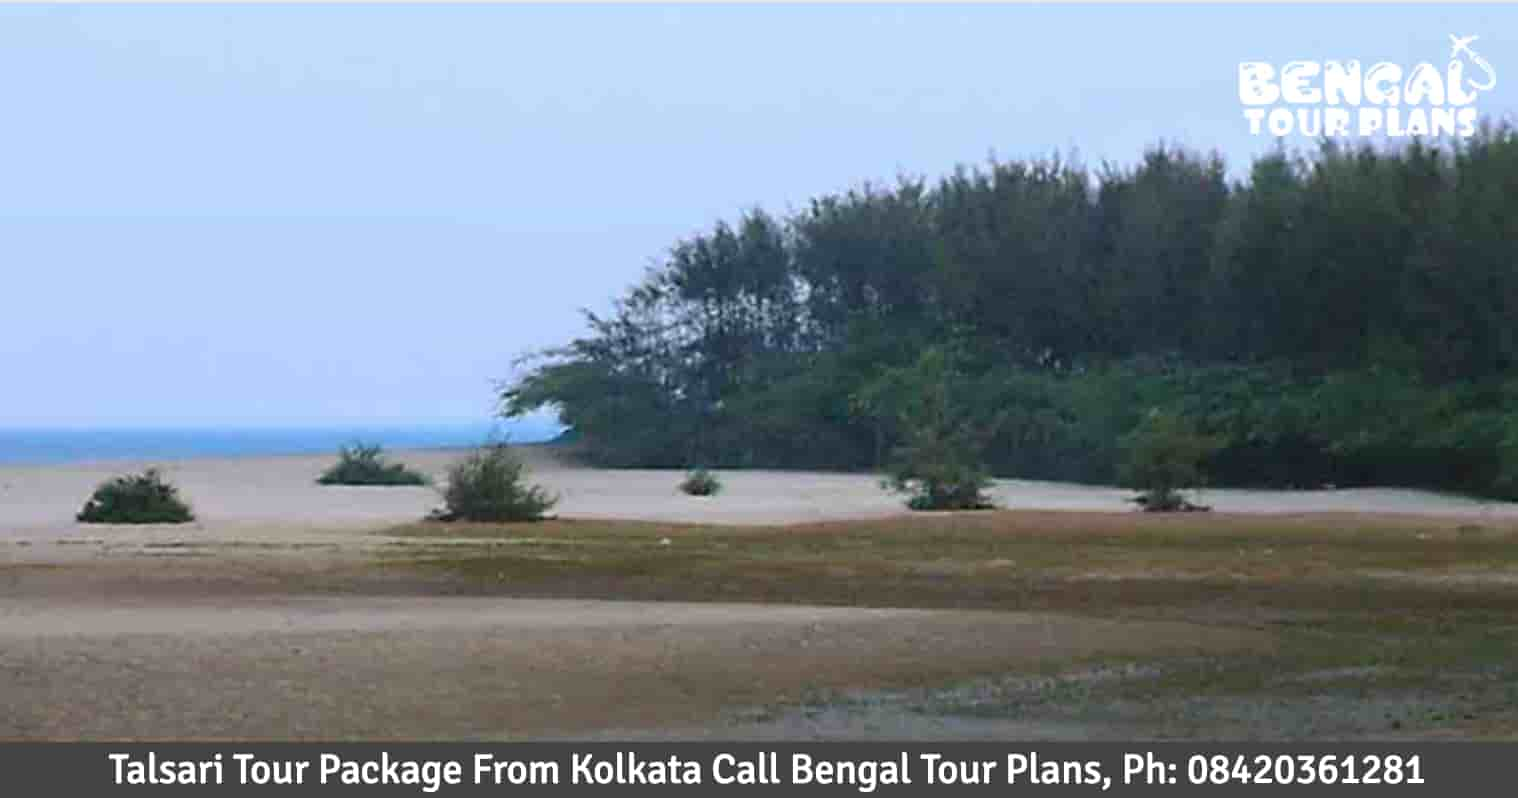 Talsari Tour Package From Kolkata